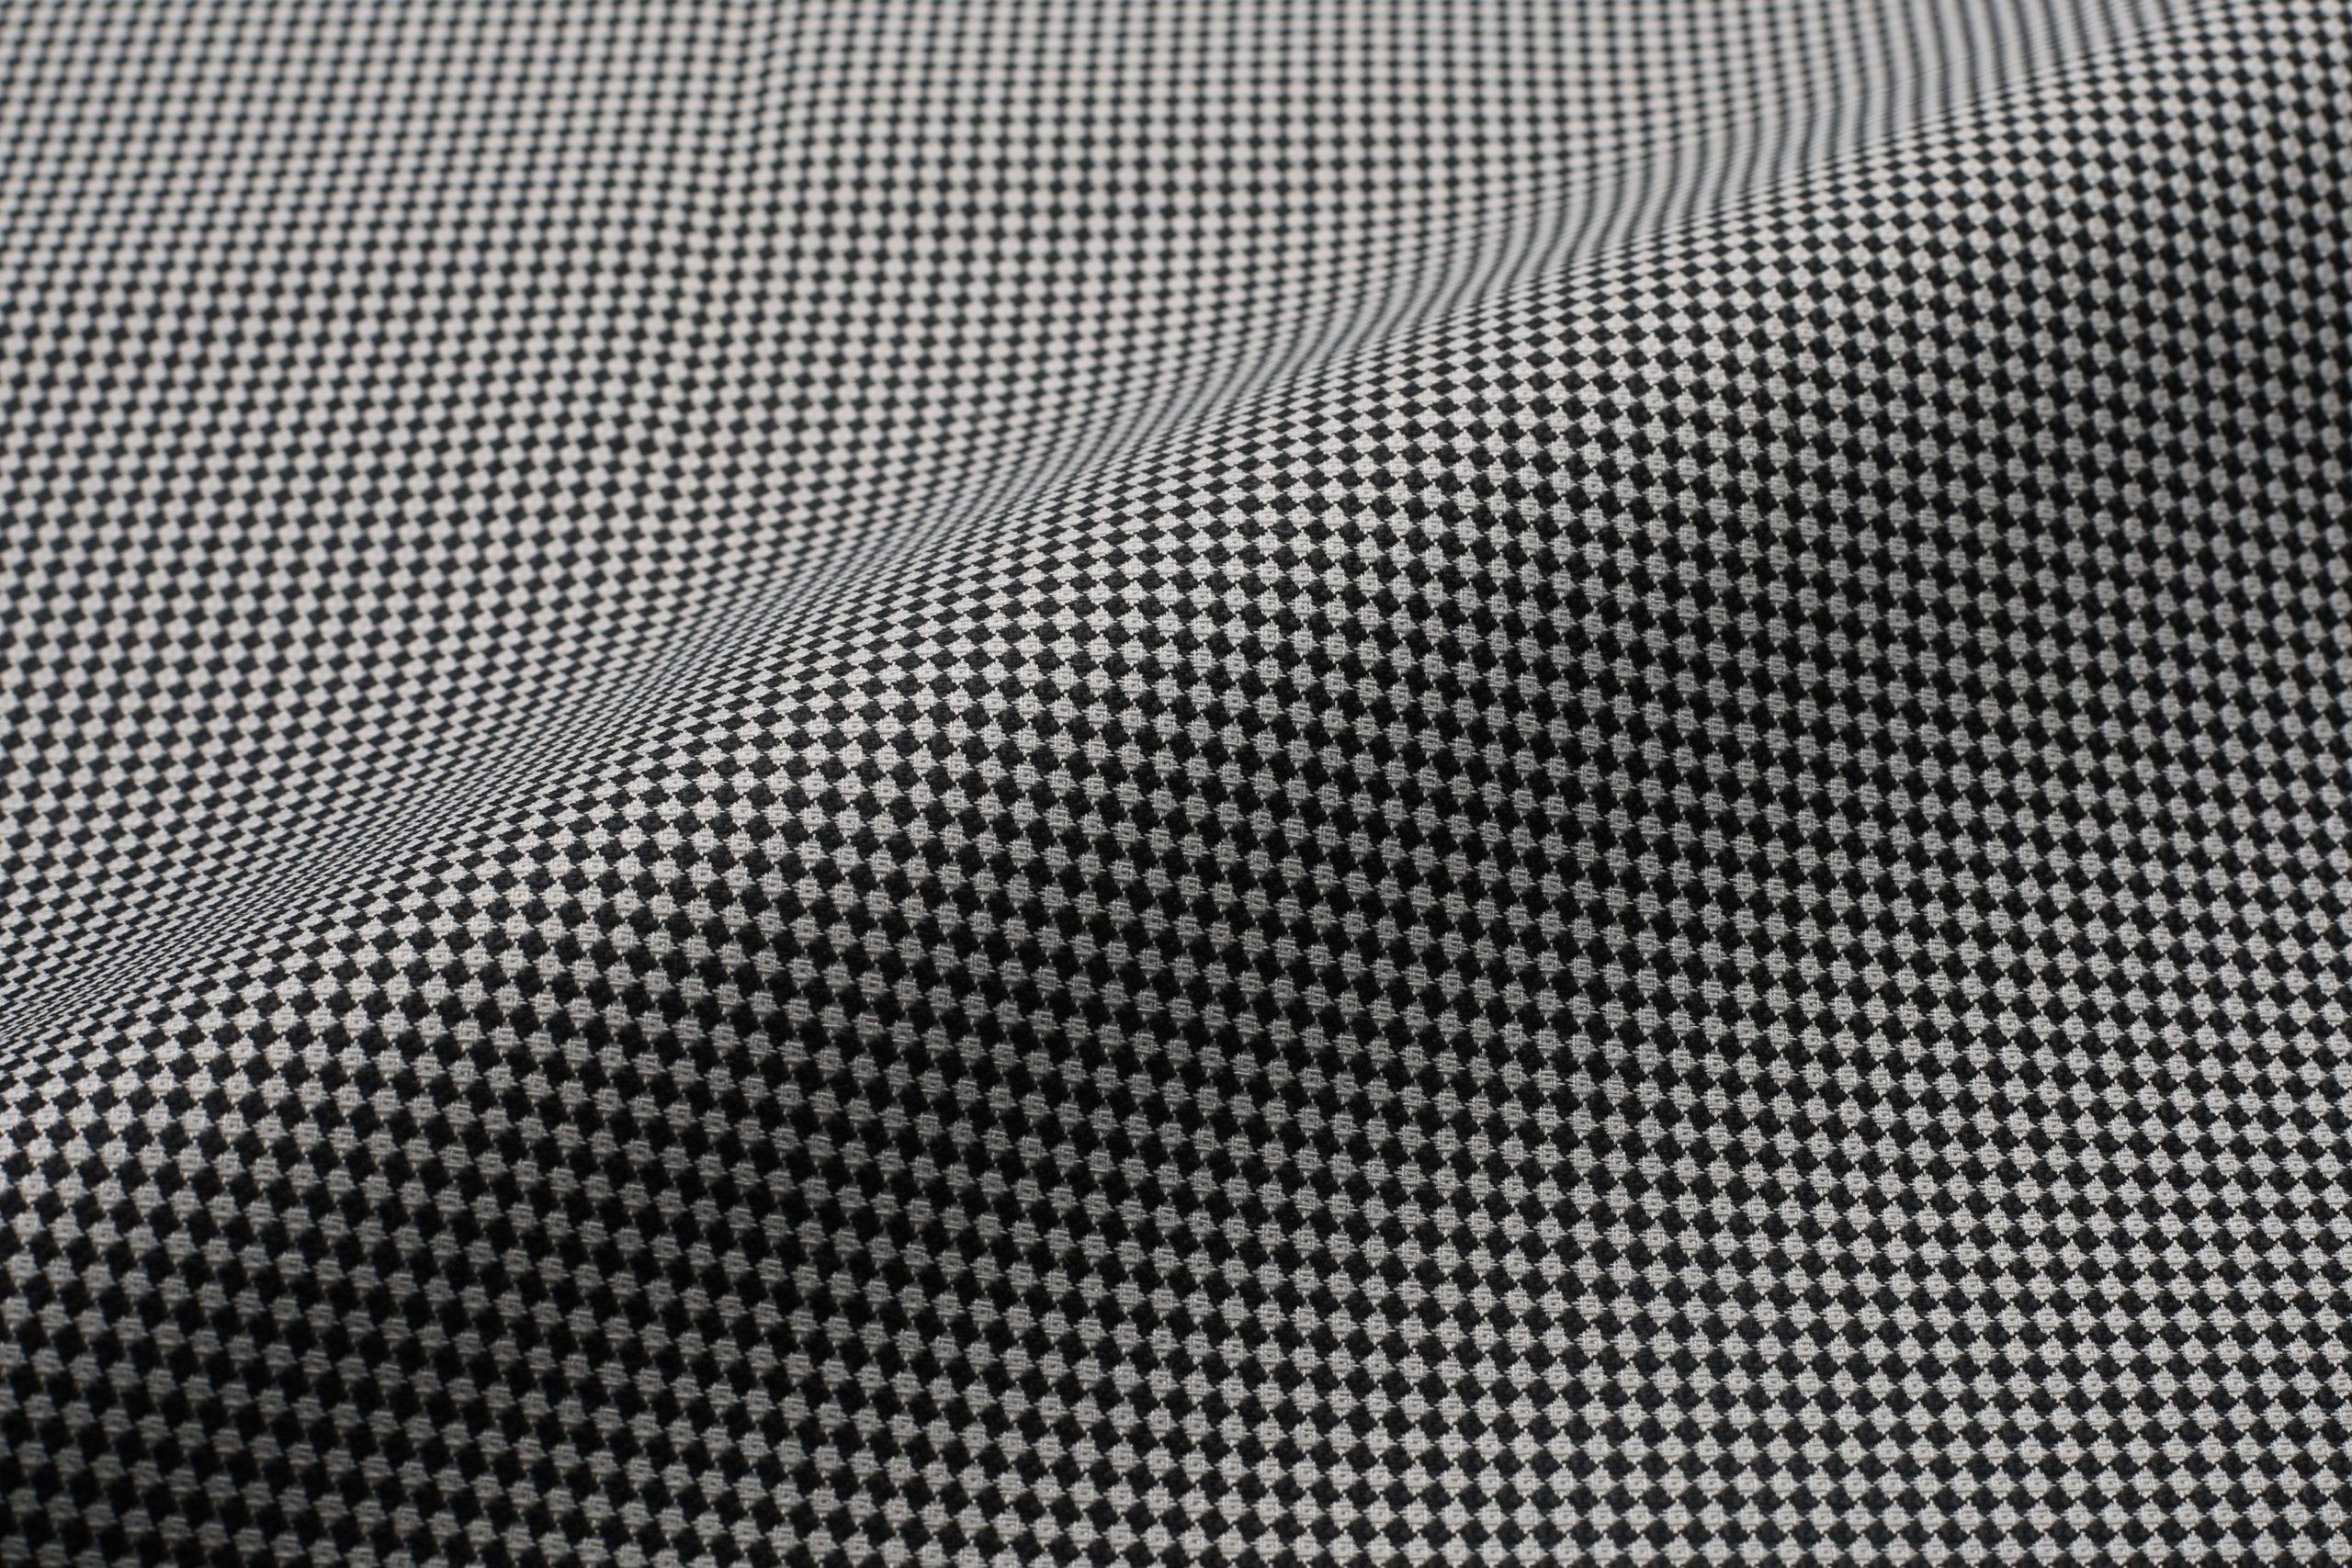 pc houndstooth fabric shirt fabric